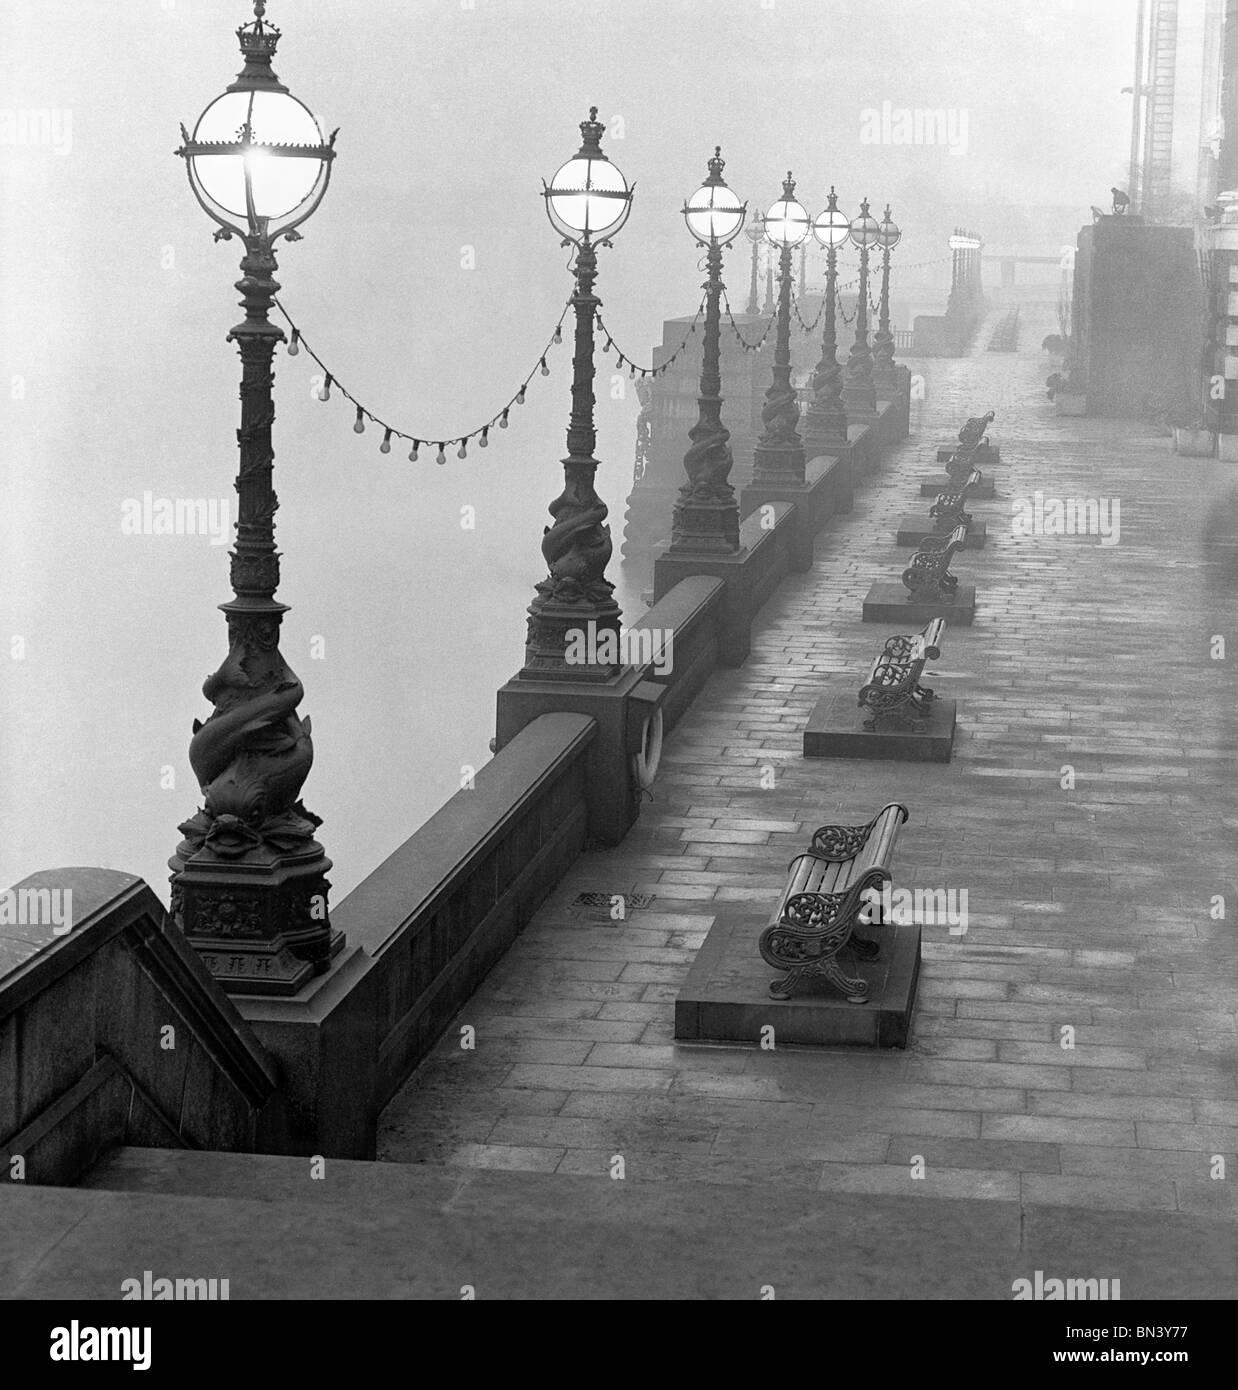 Lampioni e panchine lungo il fiume Tamigi. Foto John Gay (1909-1999). Londra, Inghilterra, c.1940 Immagini Stock